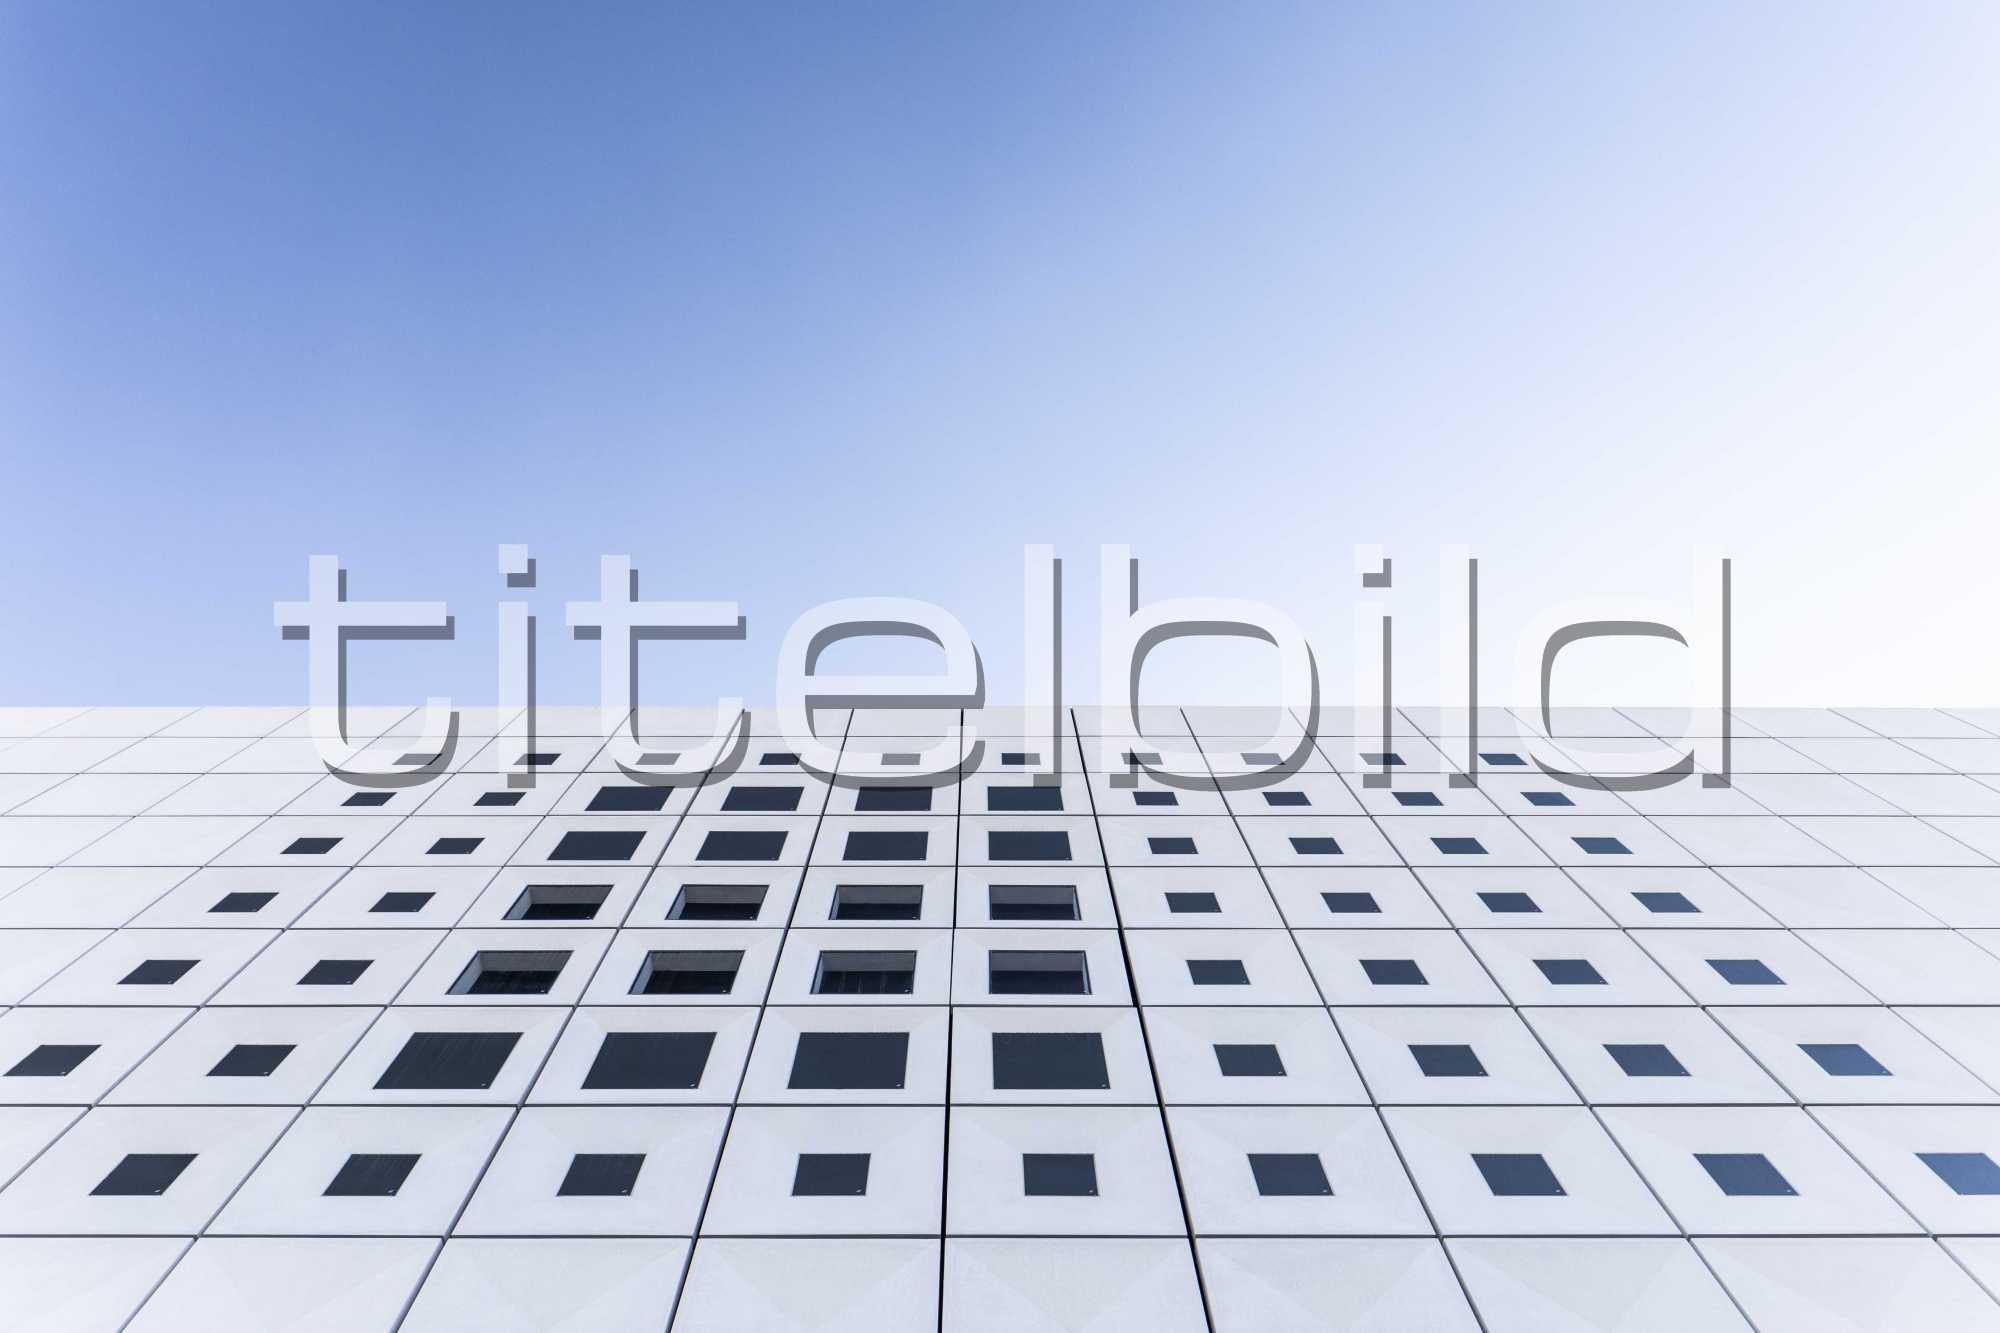 Projektbild-Nr. 4: Illuster Umbau Einkaufszentrum